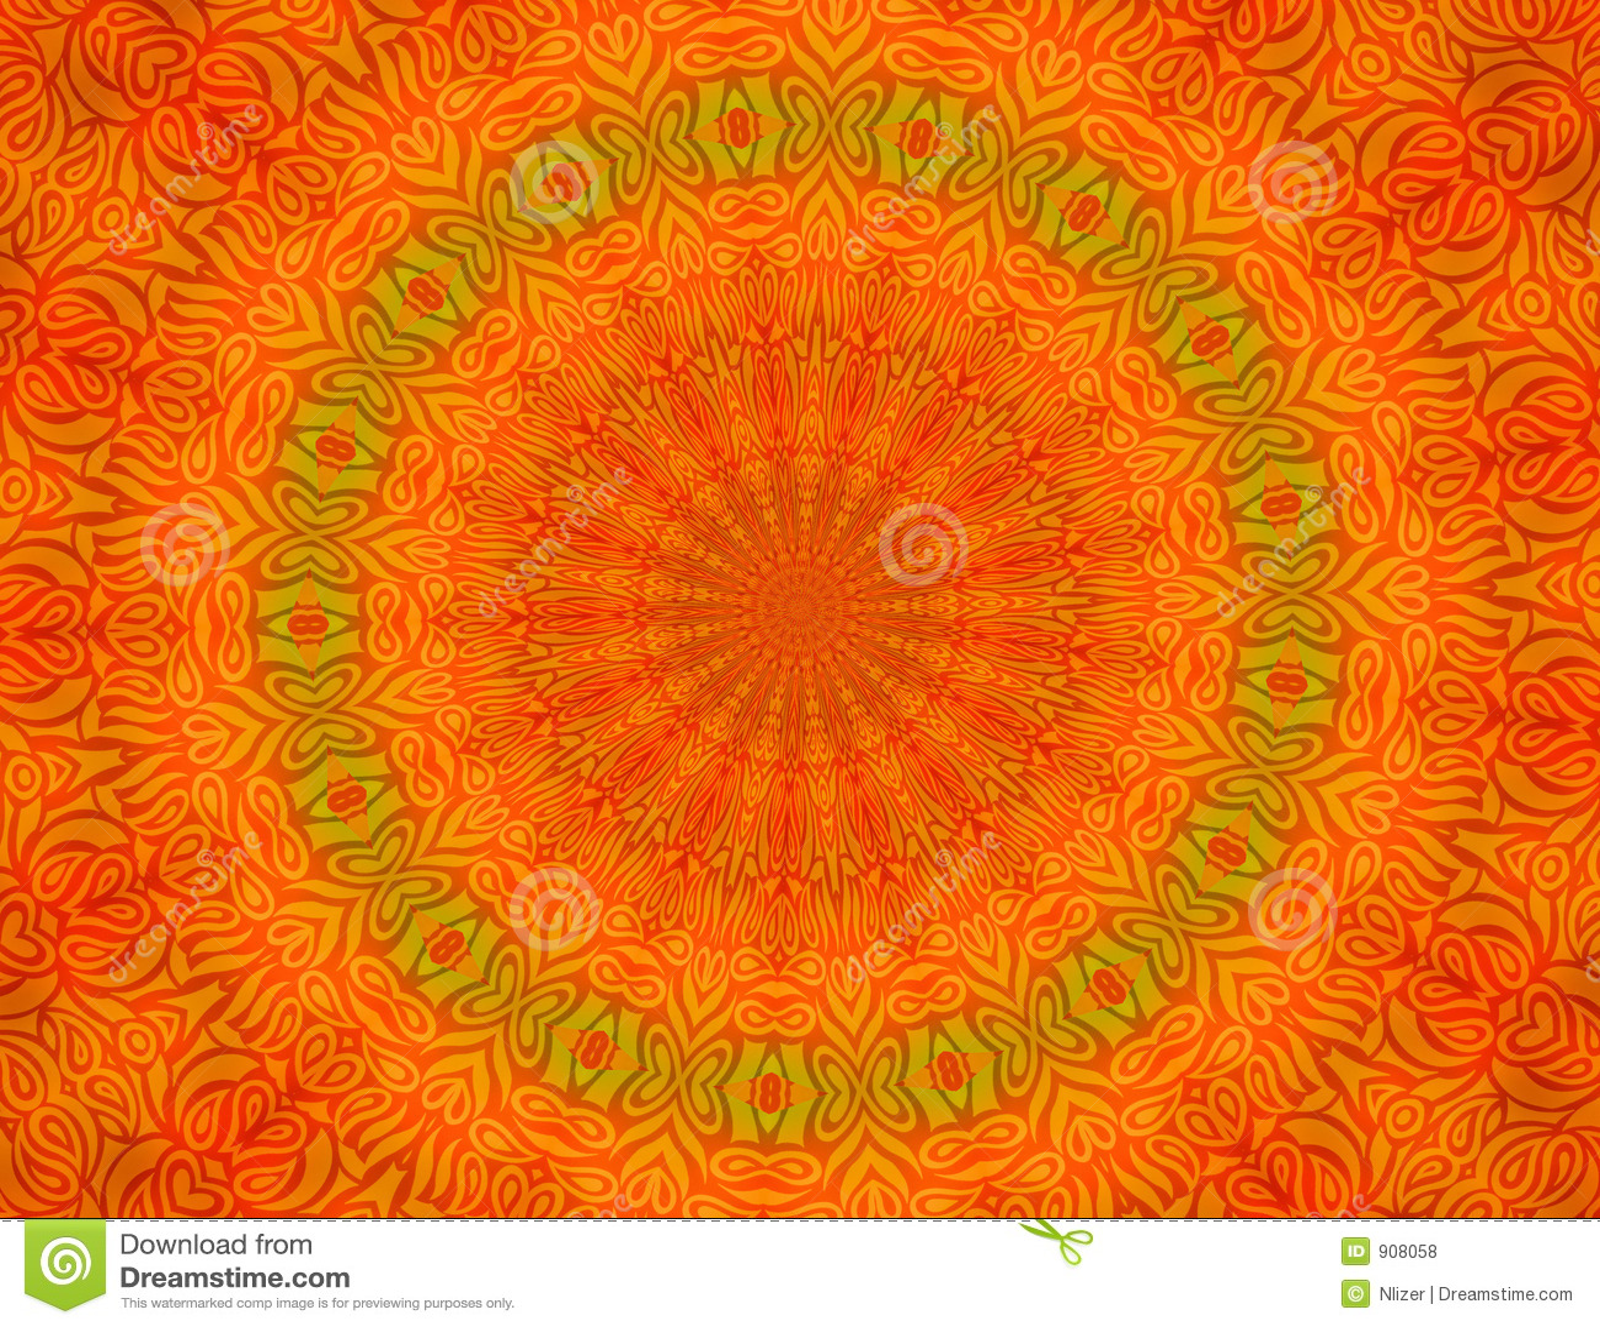 orange batik background wallpaper stock illustration